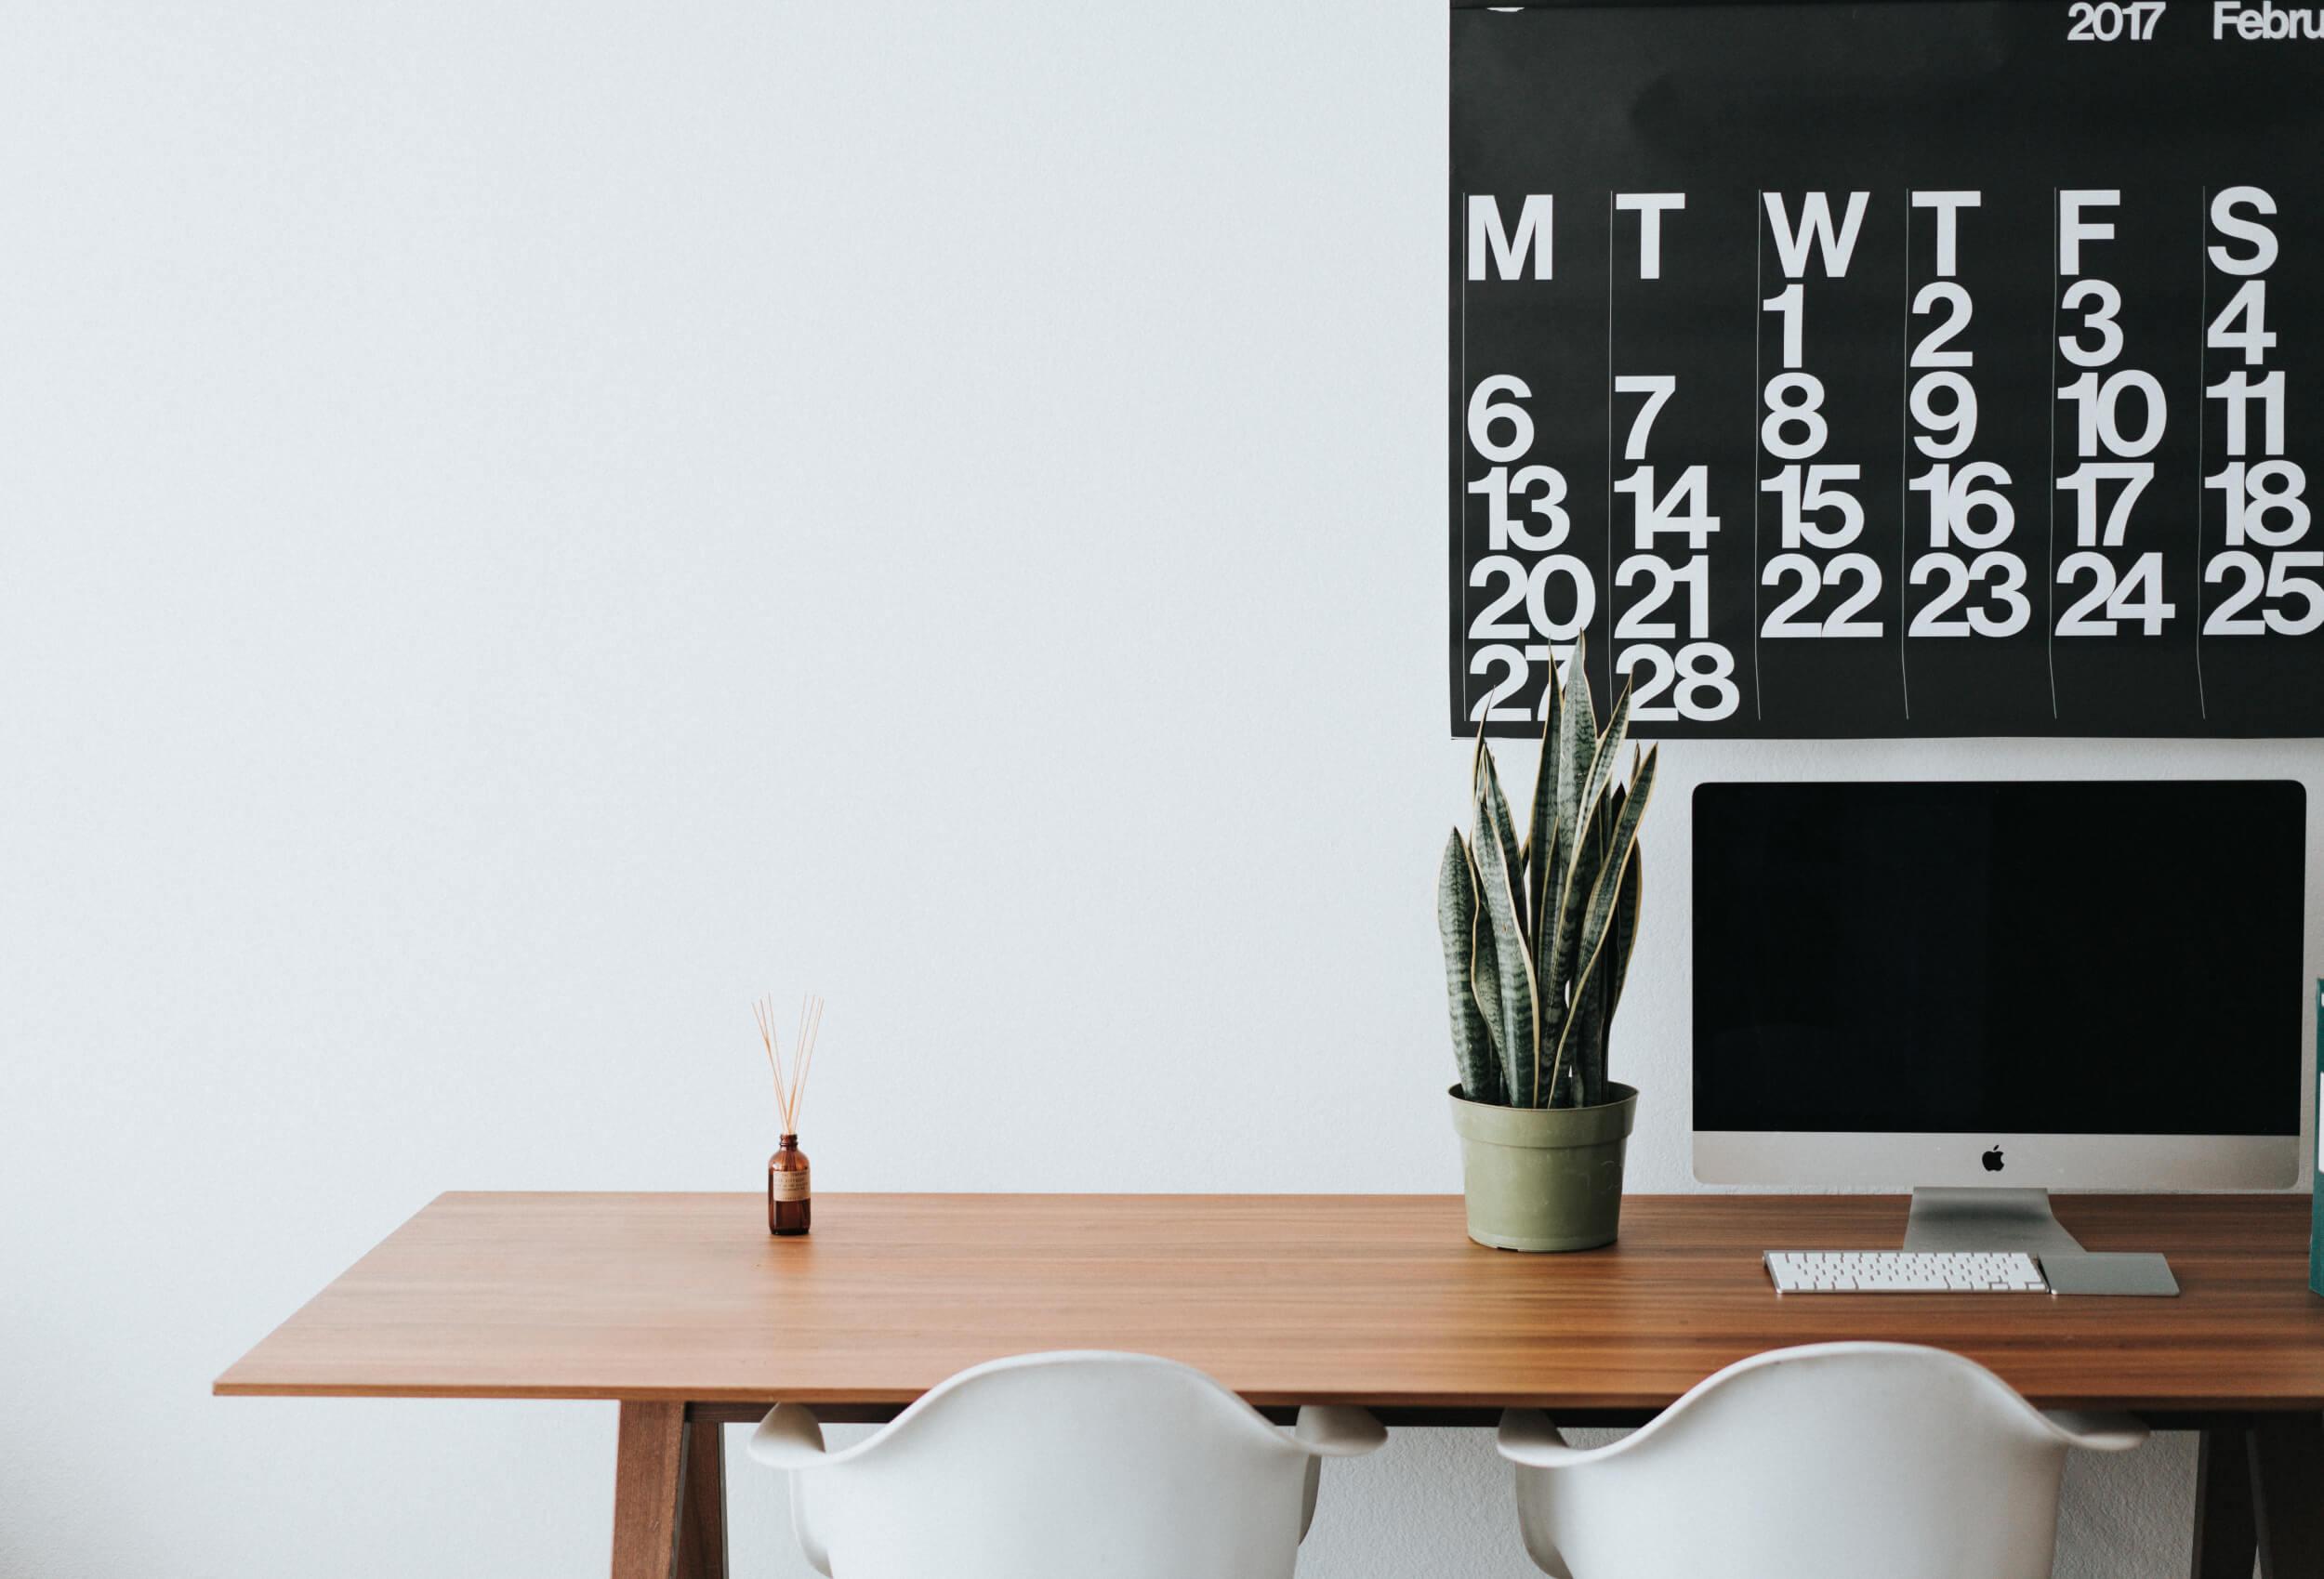 computer desk and calendar